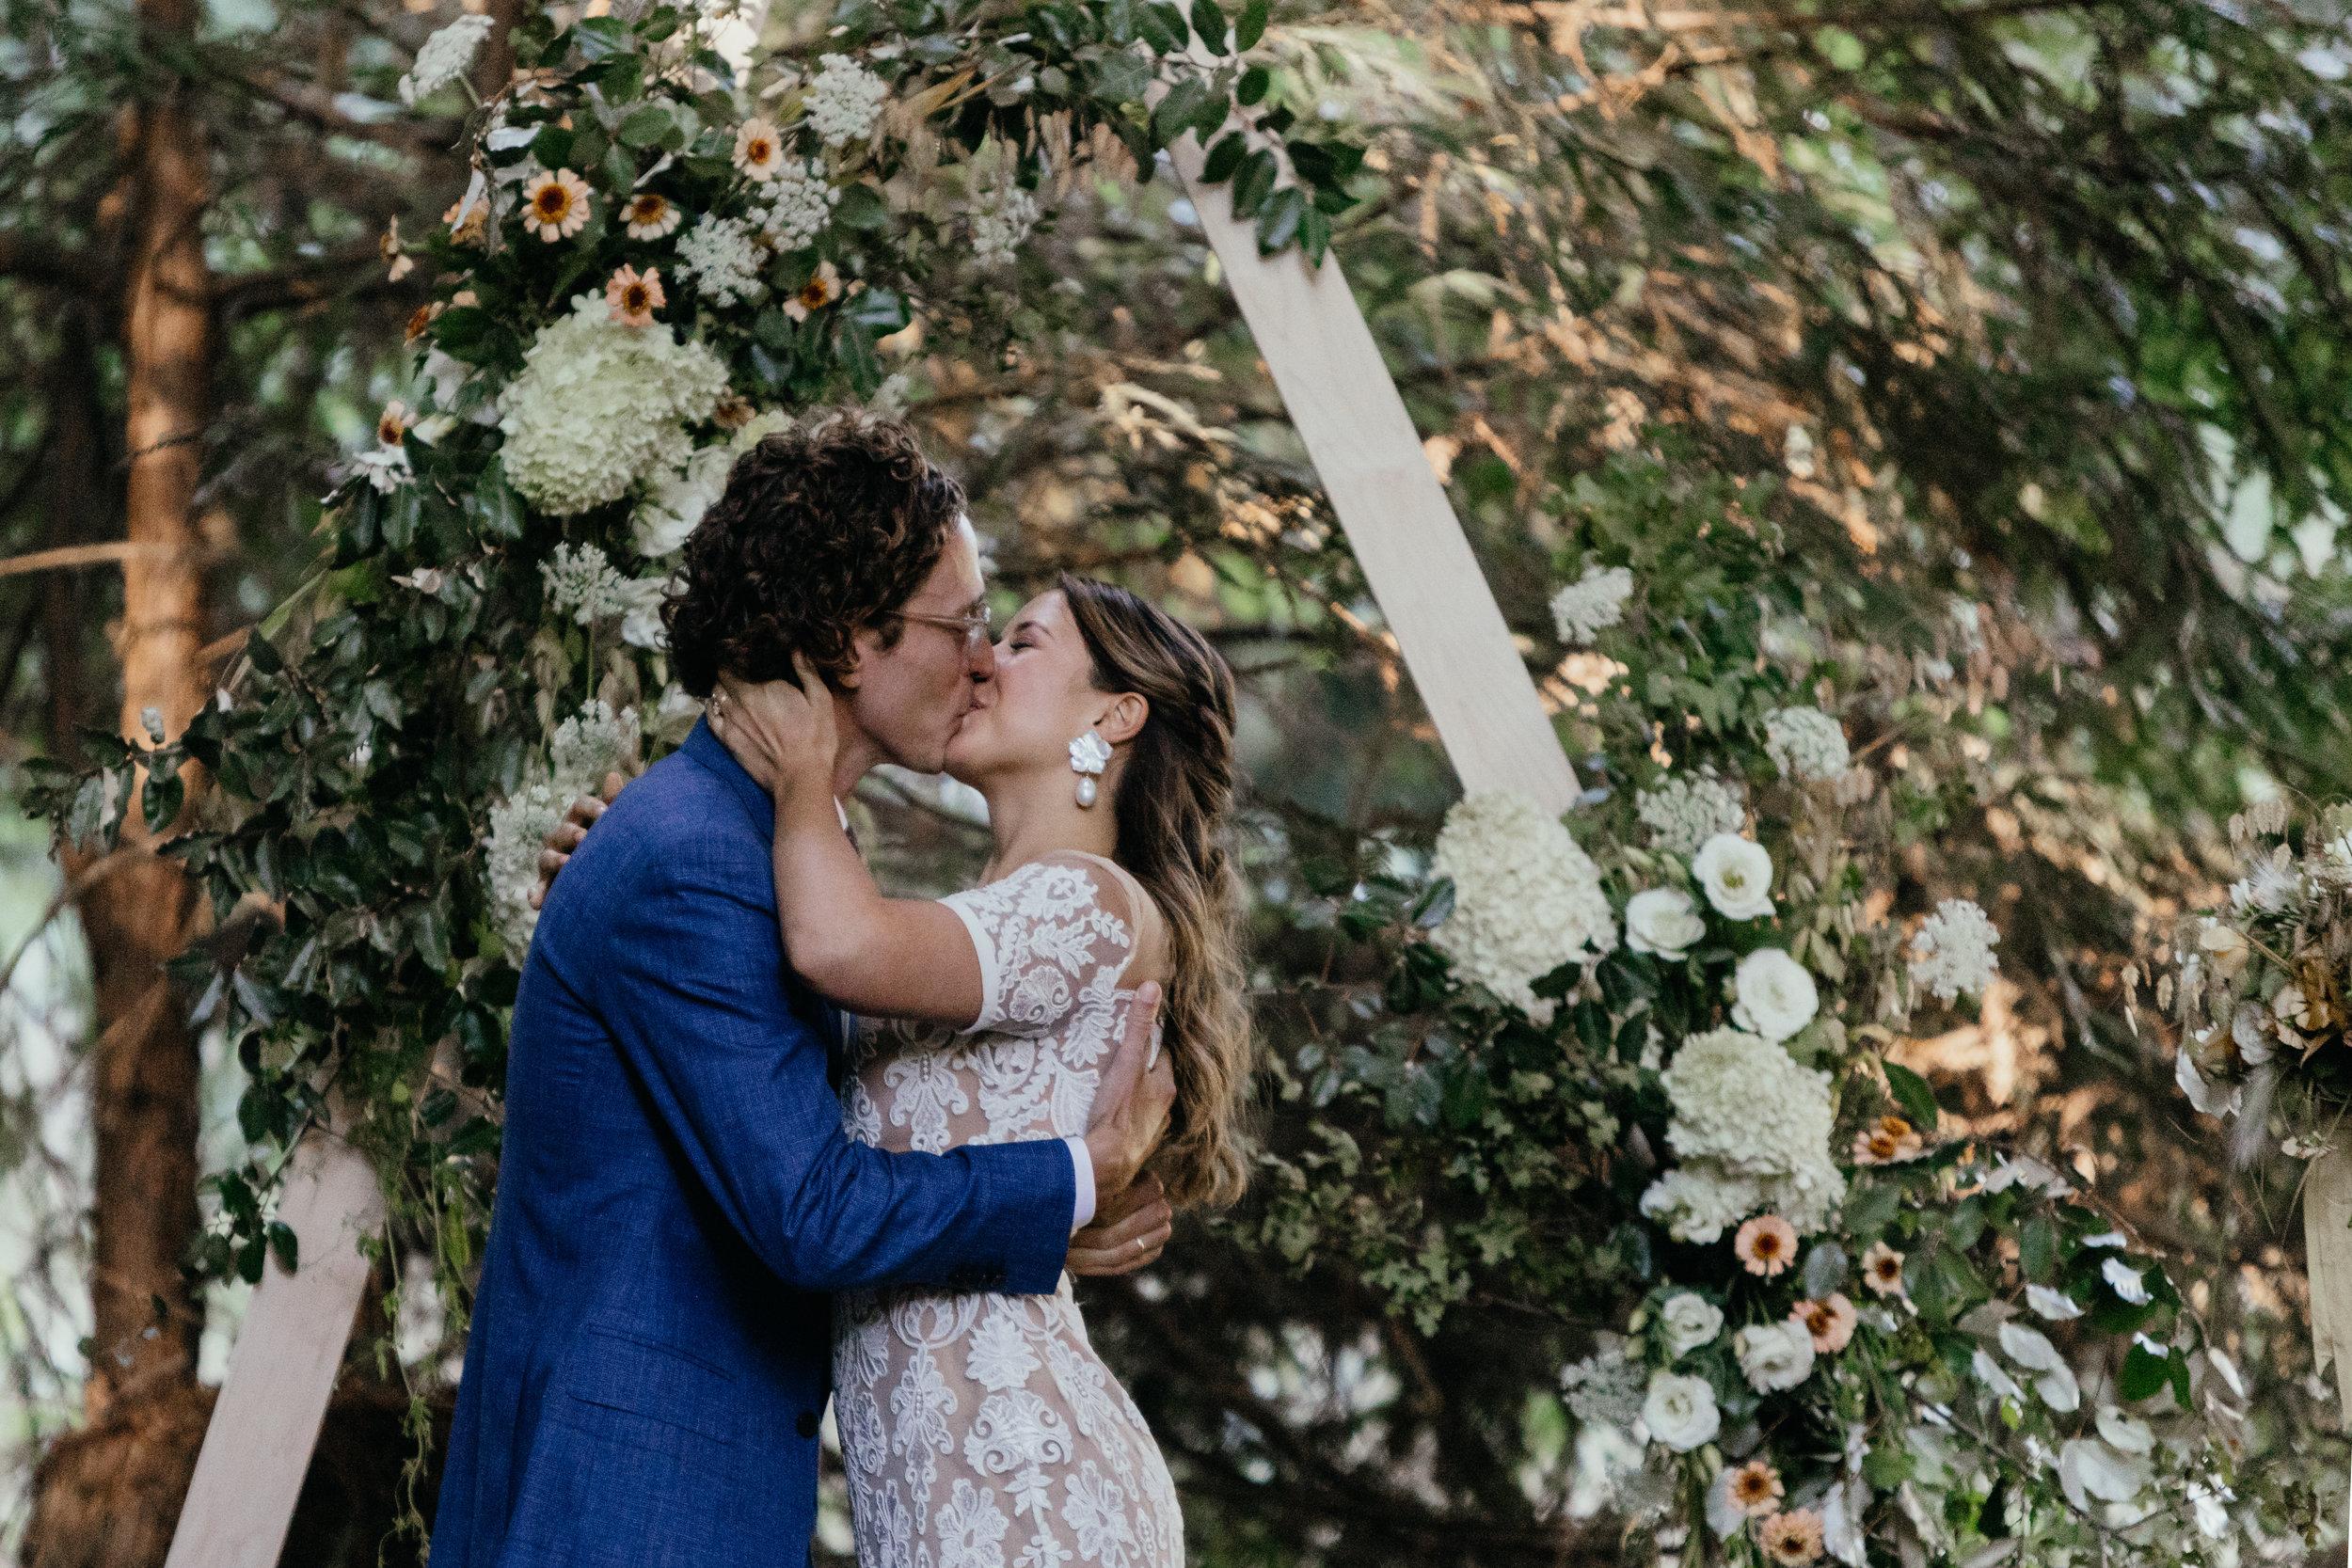 tomandalyallofweddingday-342.jpg